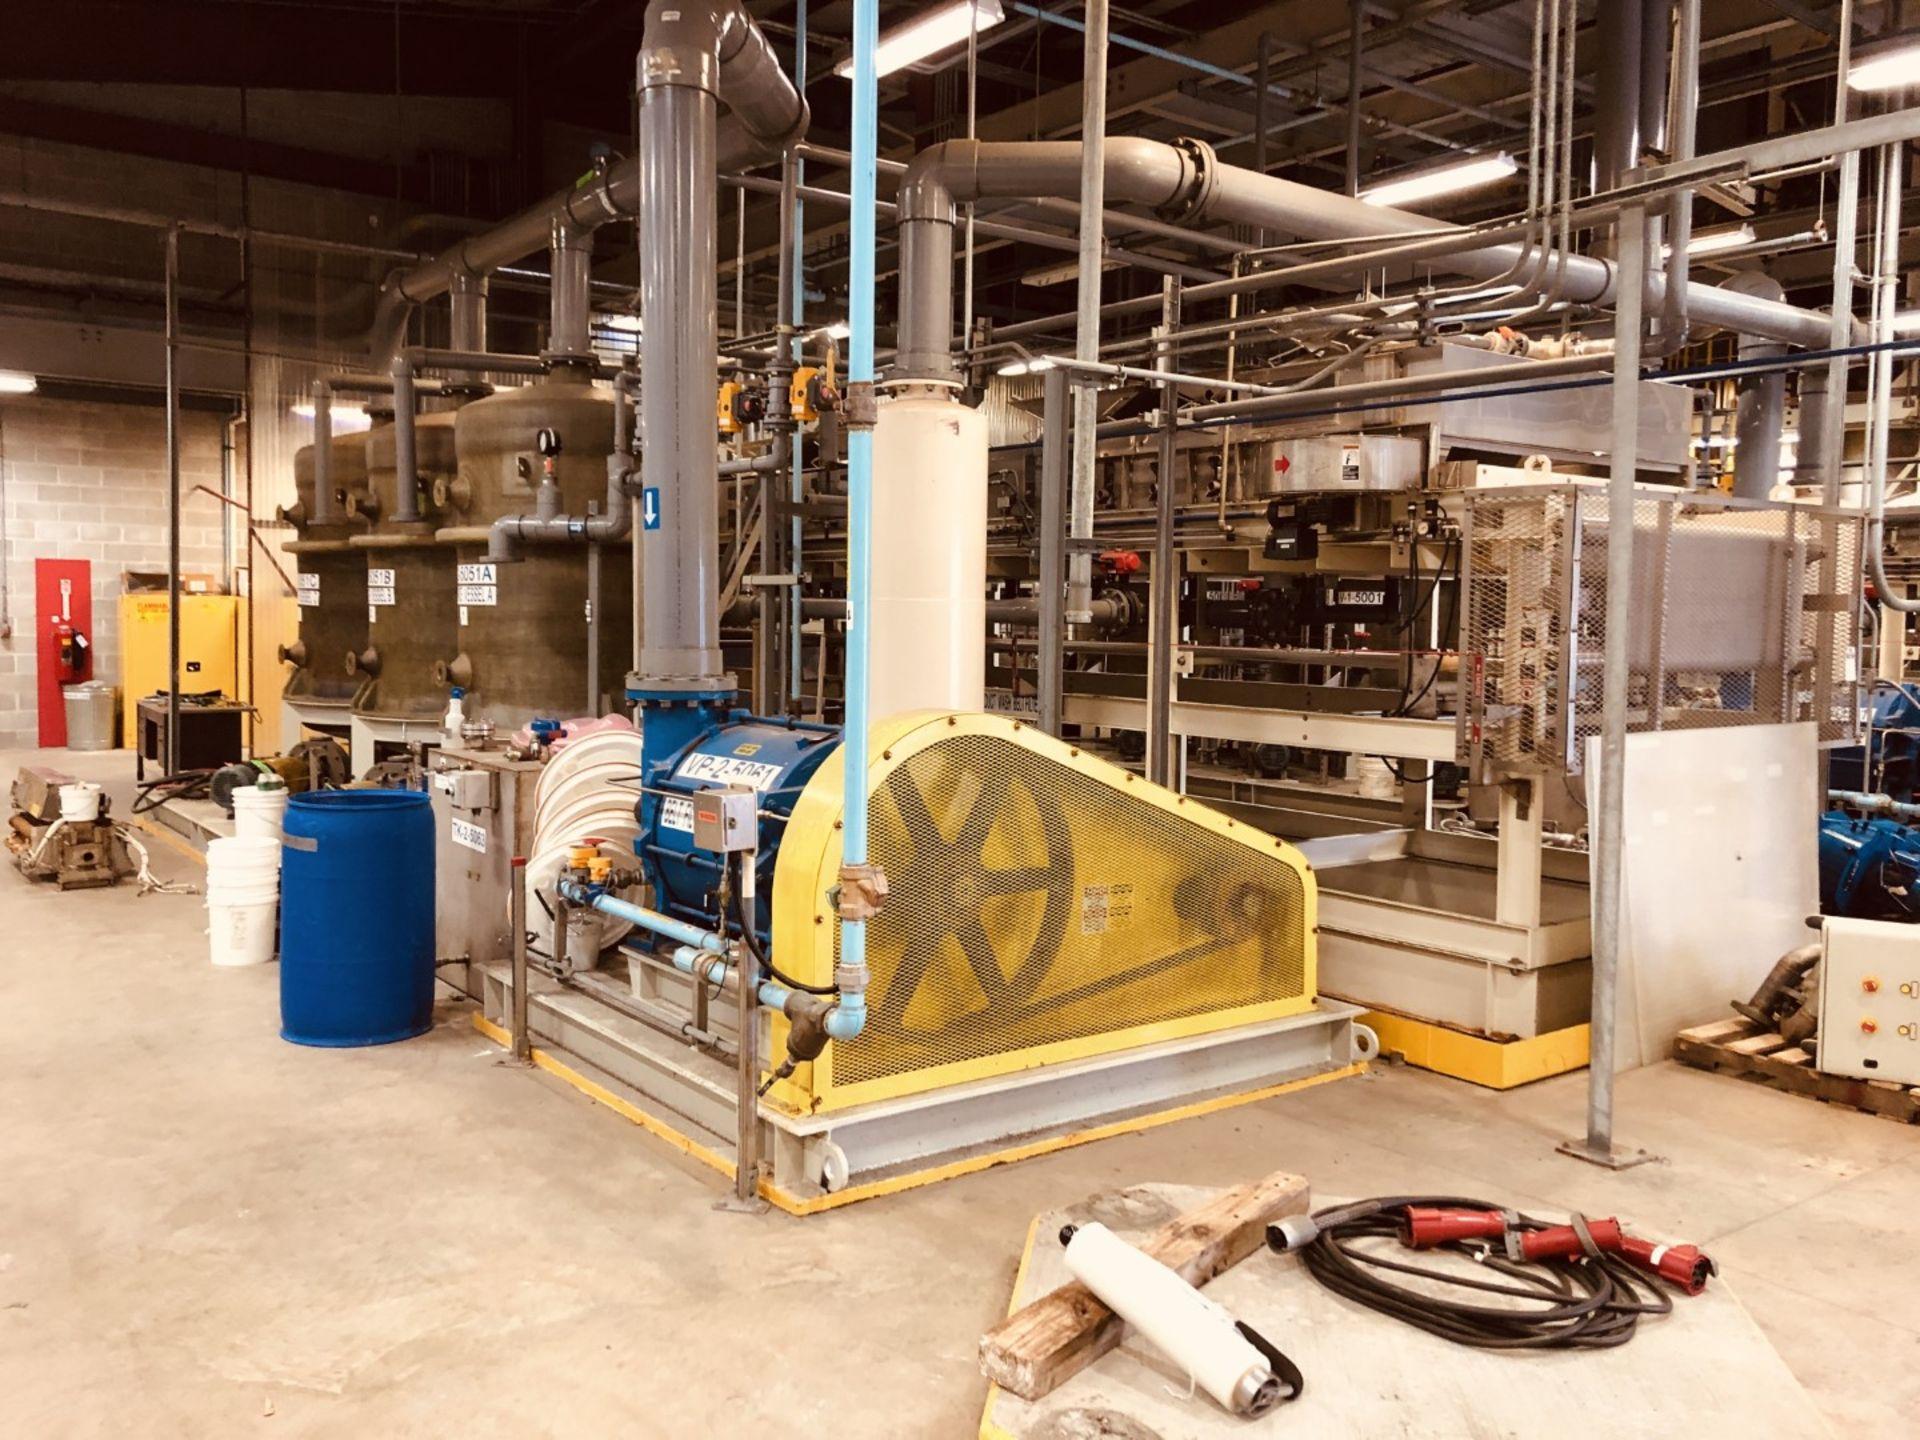 Komline Sanderson Model CIX HVF 1.25x9.75m 11.25 Sq Meter Horizontal Belt Vacuum Filter - Image 3 of 14